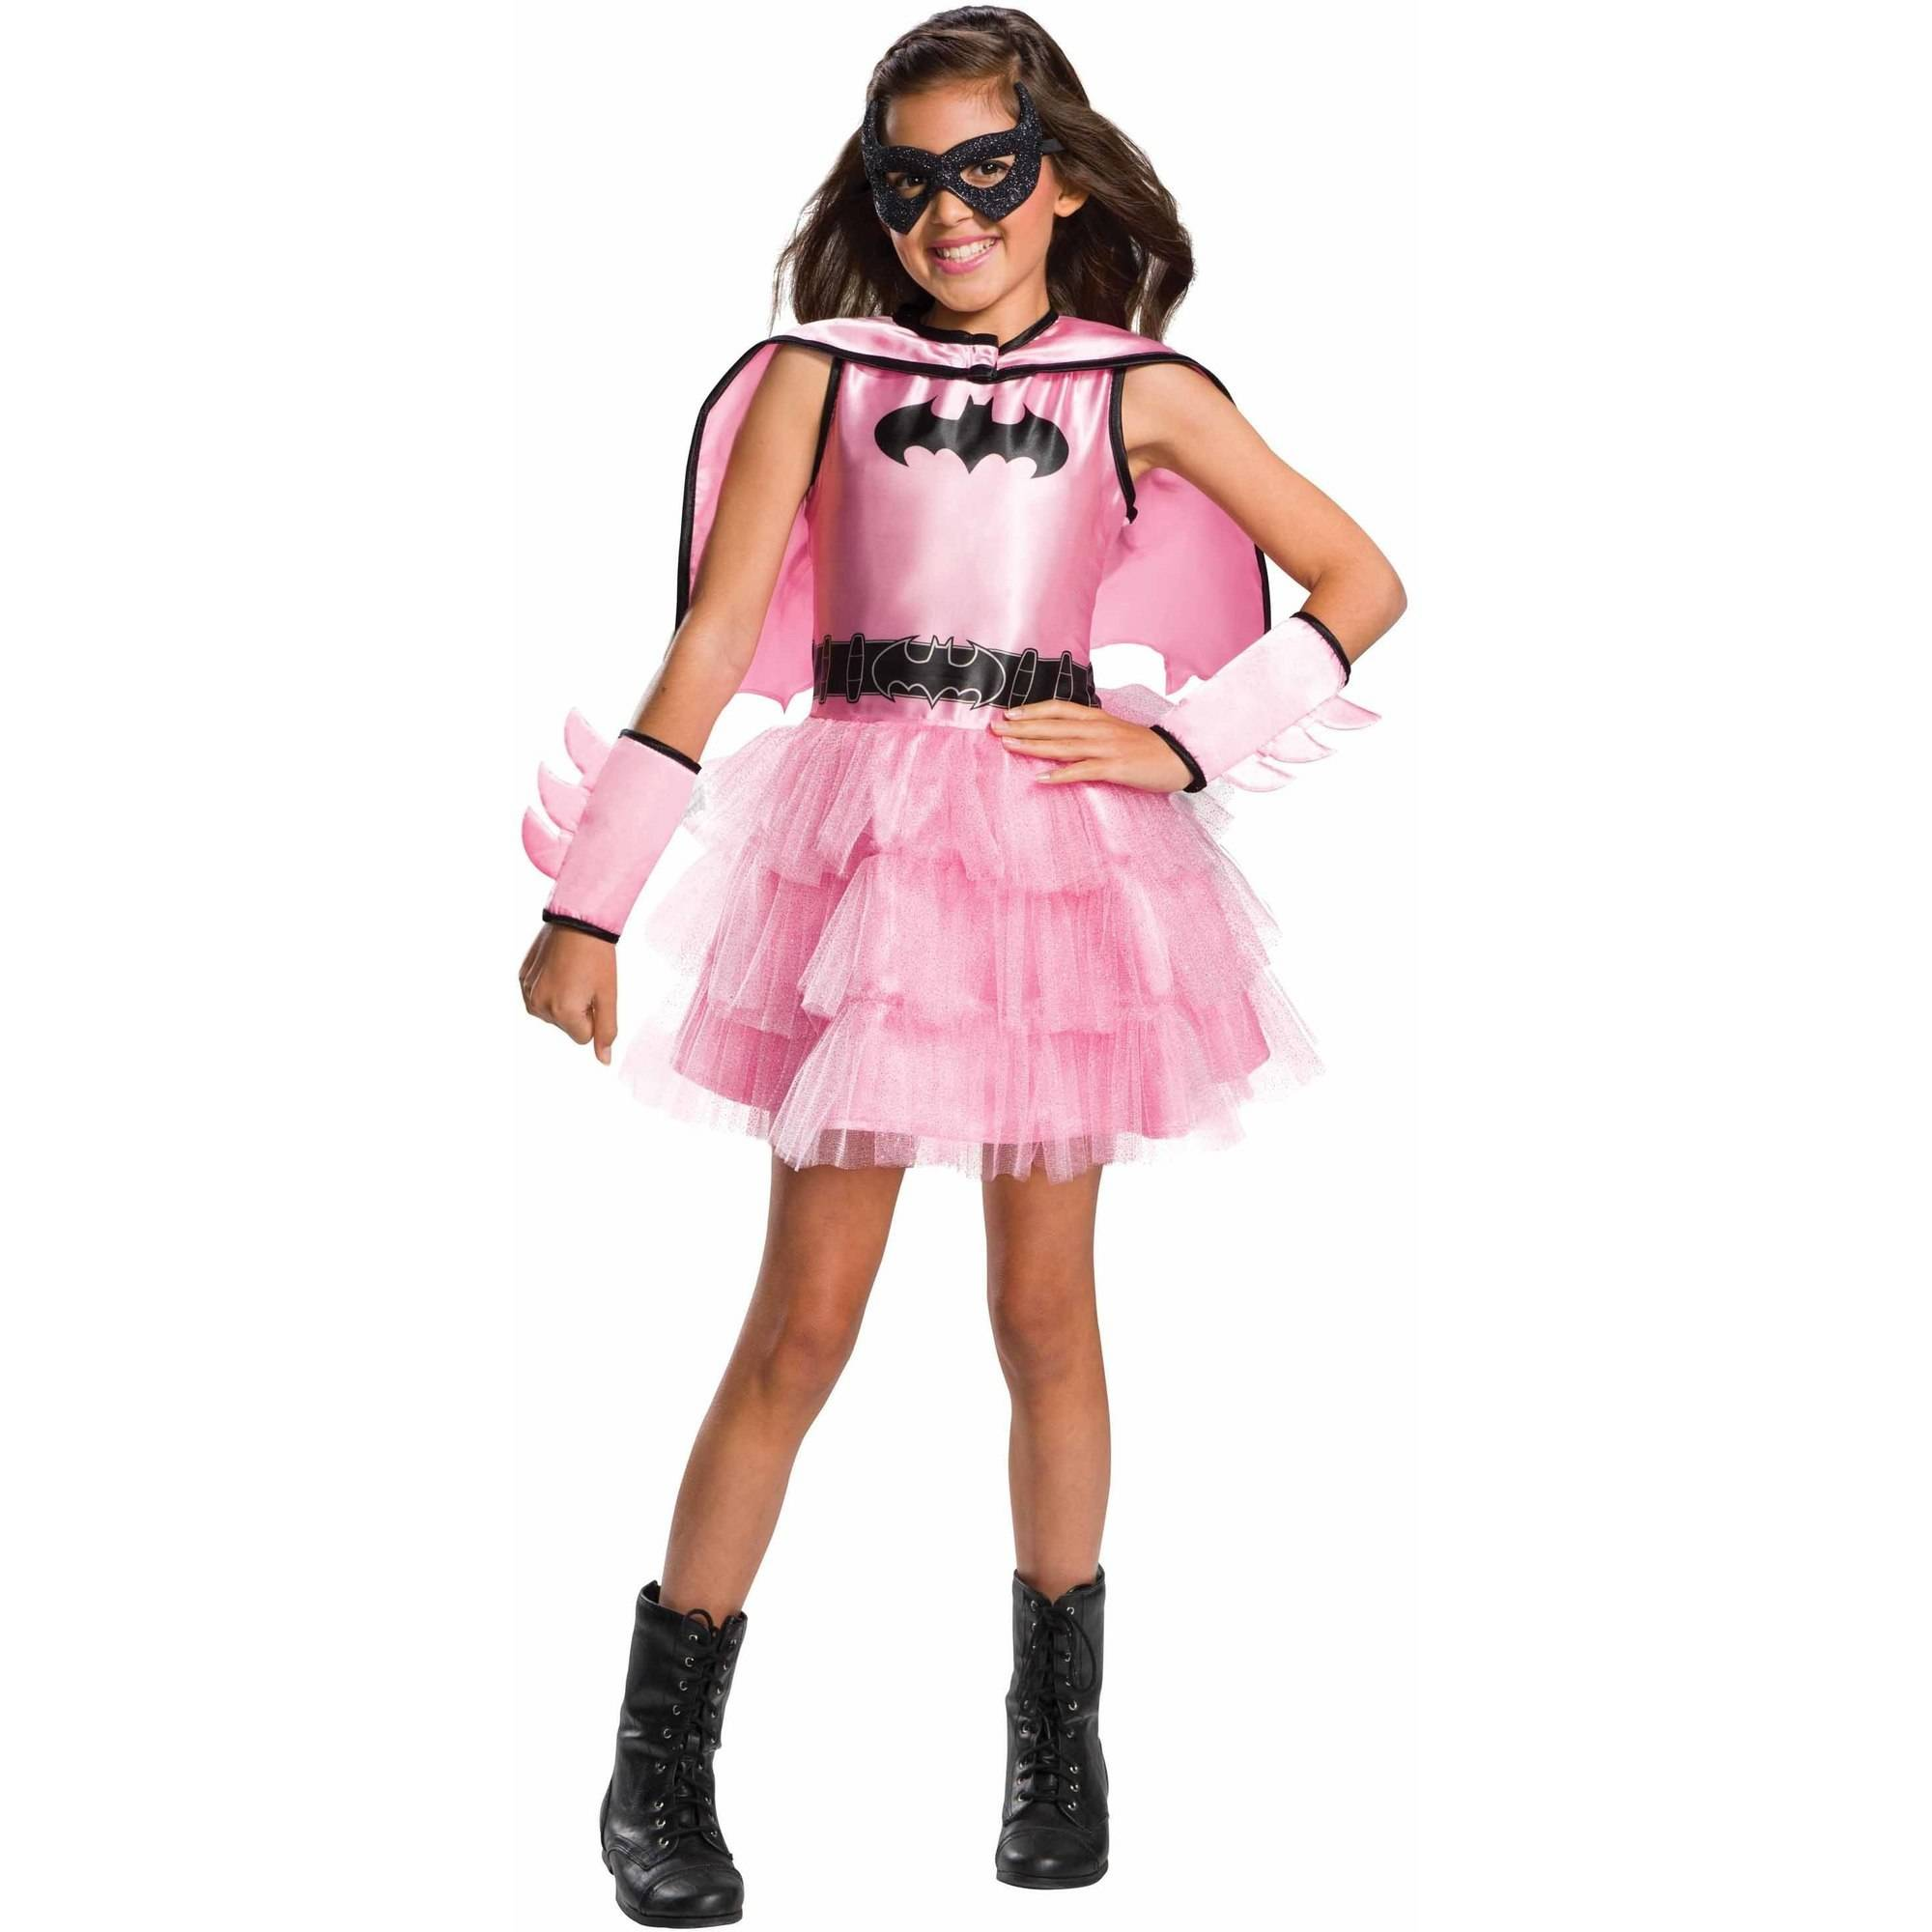 Pink Batgirl Child's Costume, Medium (8-10)